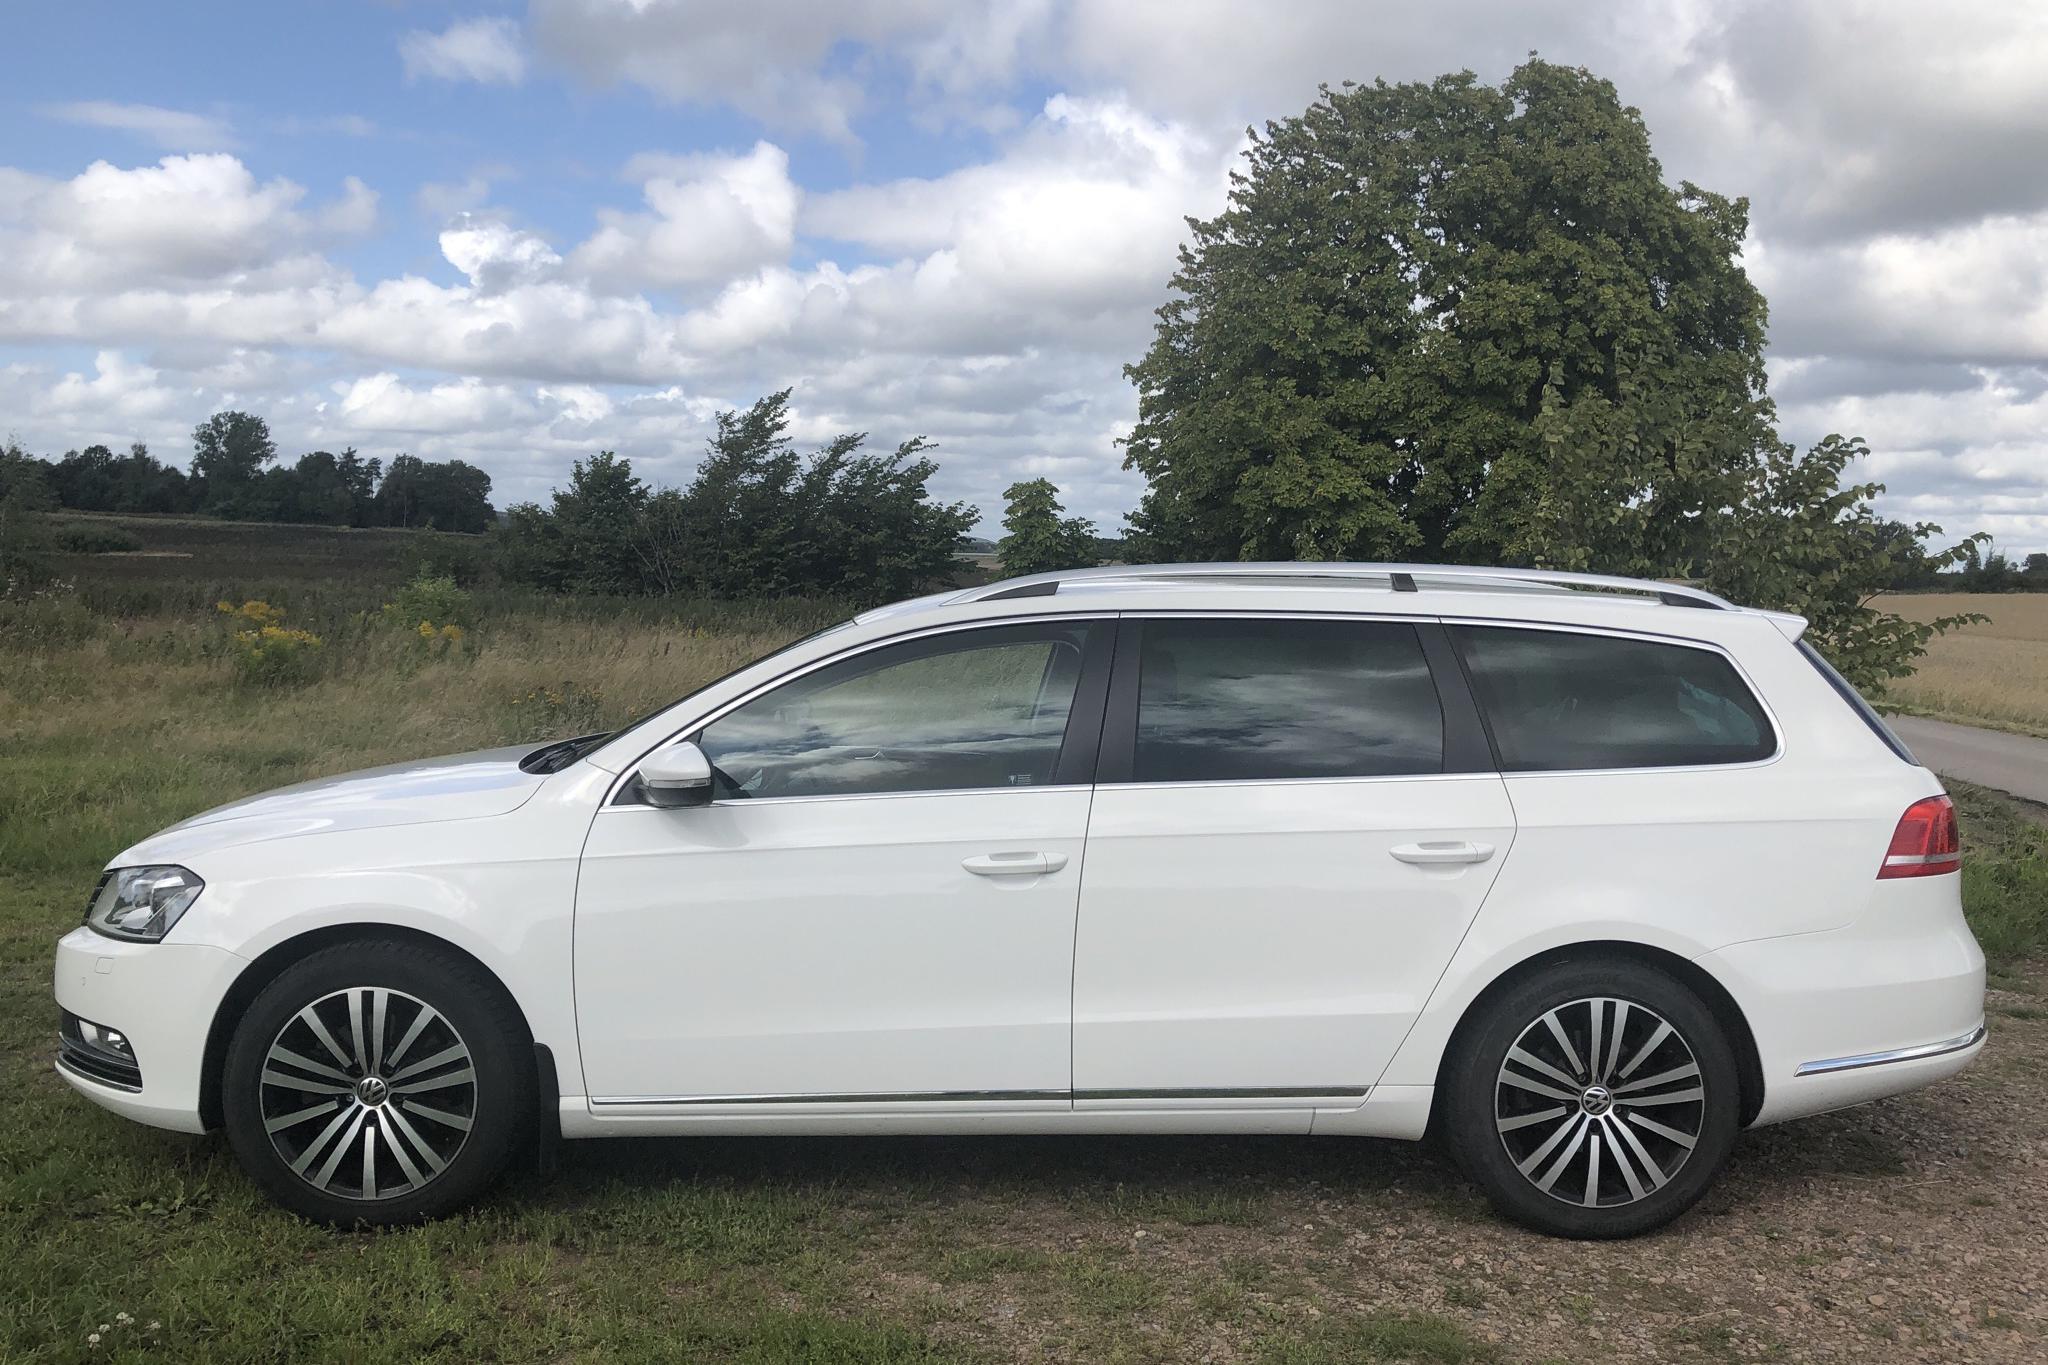 VW Passat 1.4 TSI EcoFuel Variant (150hk) - 159 530 km - Automatic - white - 2012